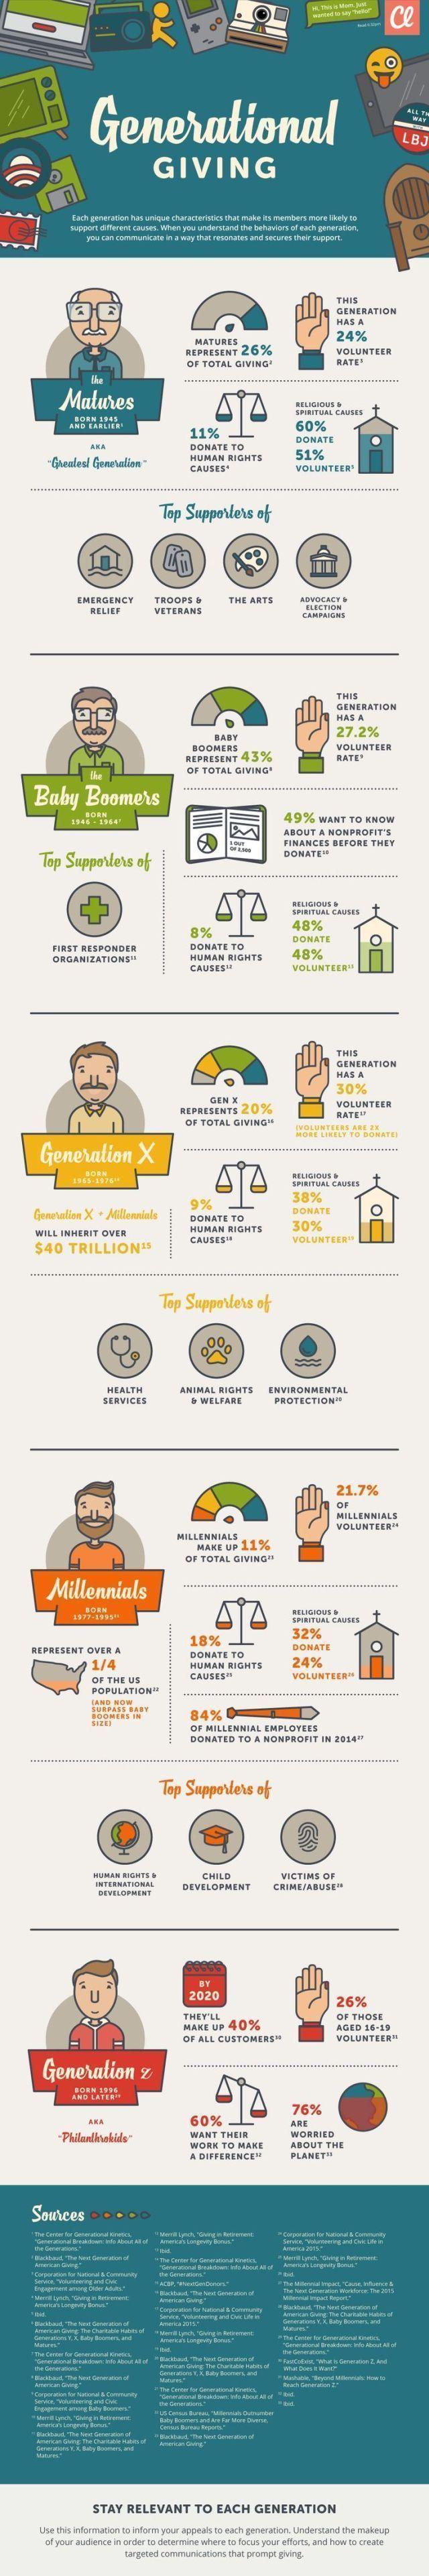 fundraising infographic : fundraising infographic : fundraising infographic : fundraising infographic : IN